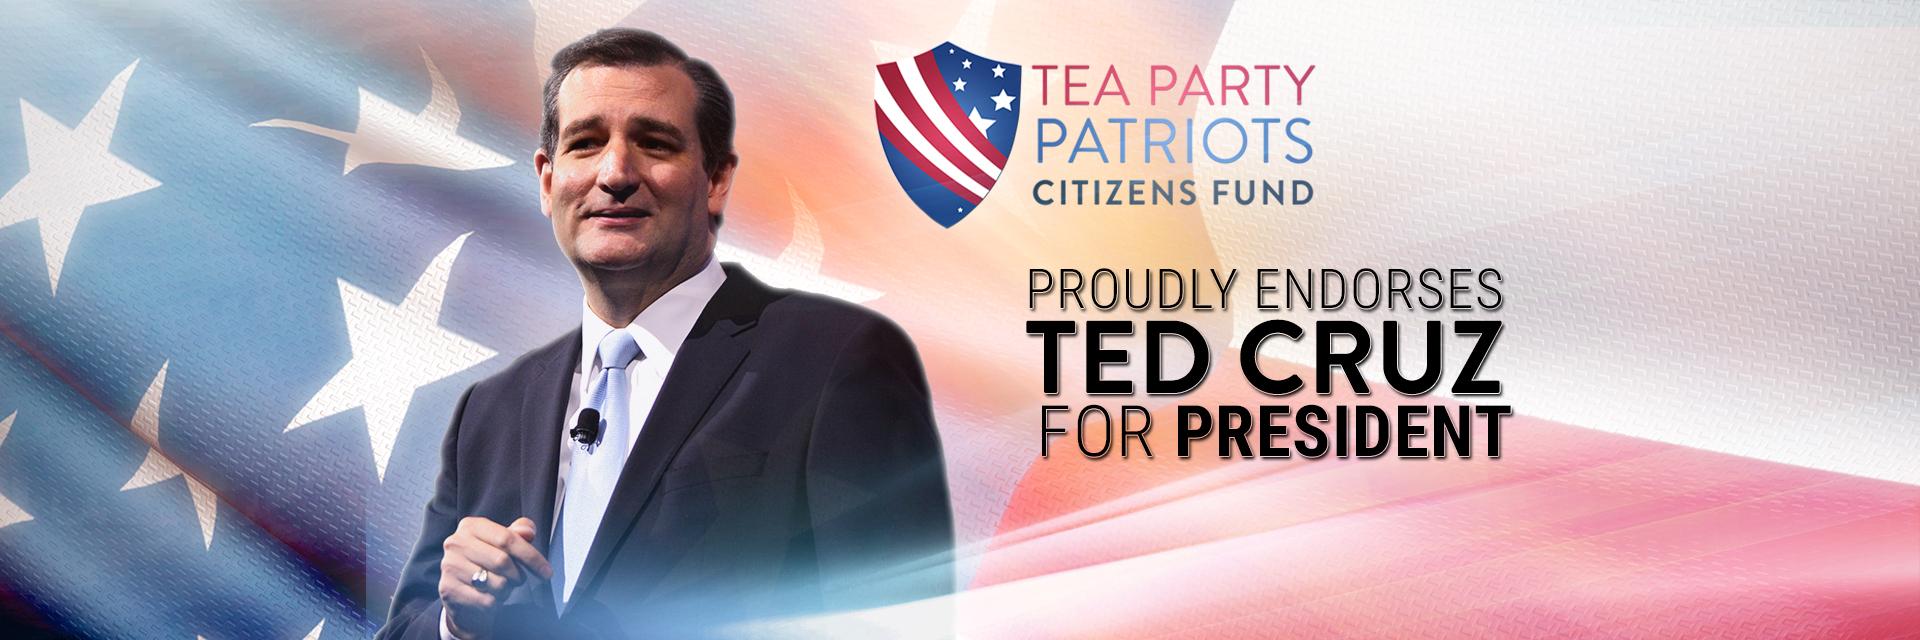 Tea-Party-Patriots-Citizens-Fund-Endorsement-Ted-Cruz-2.jpg